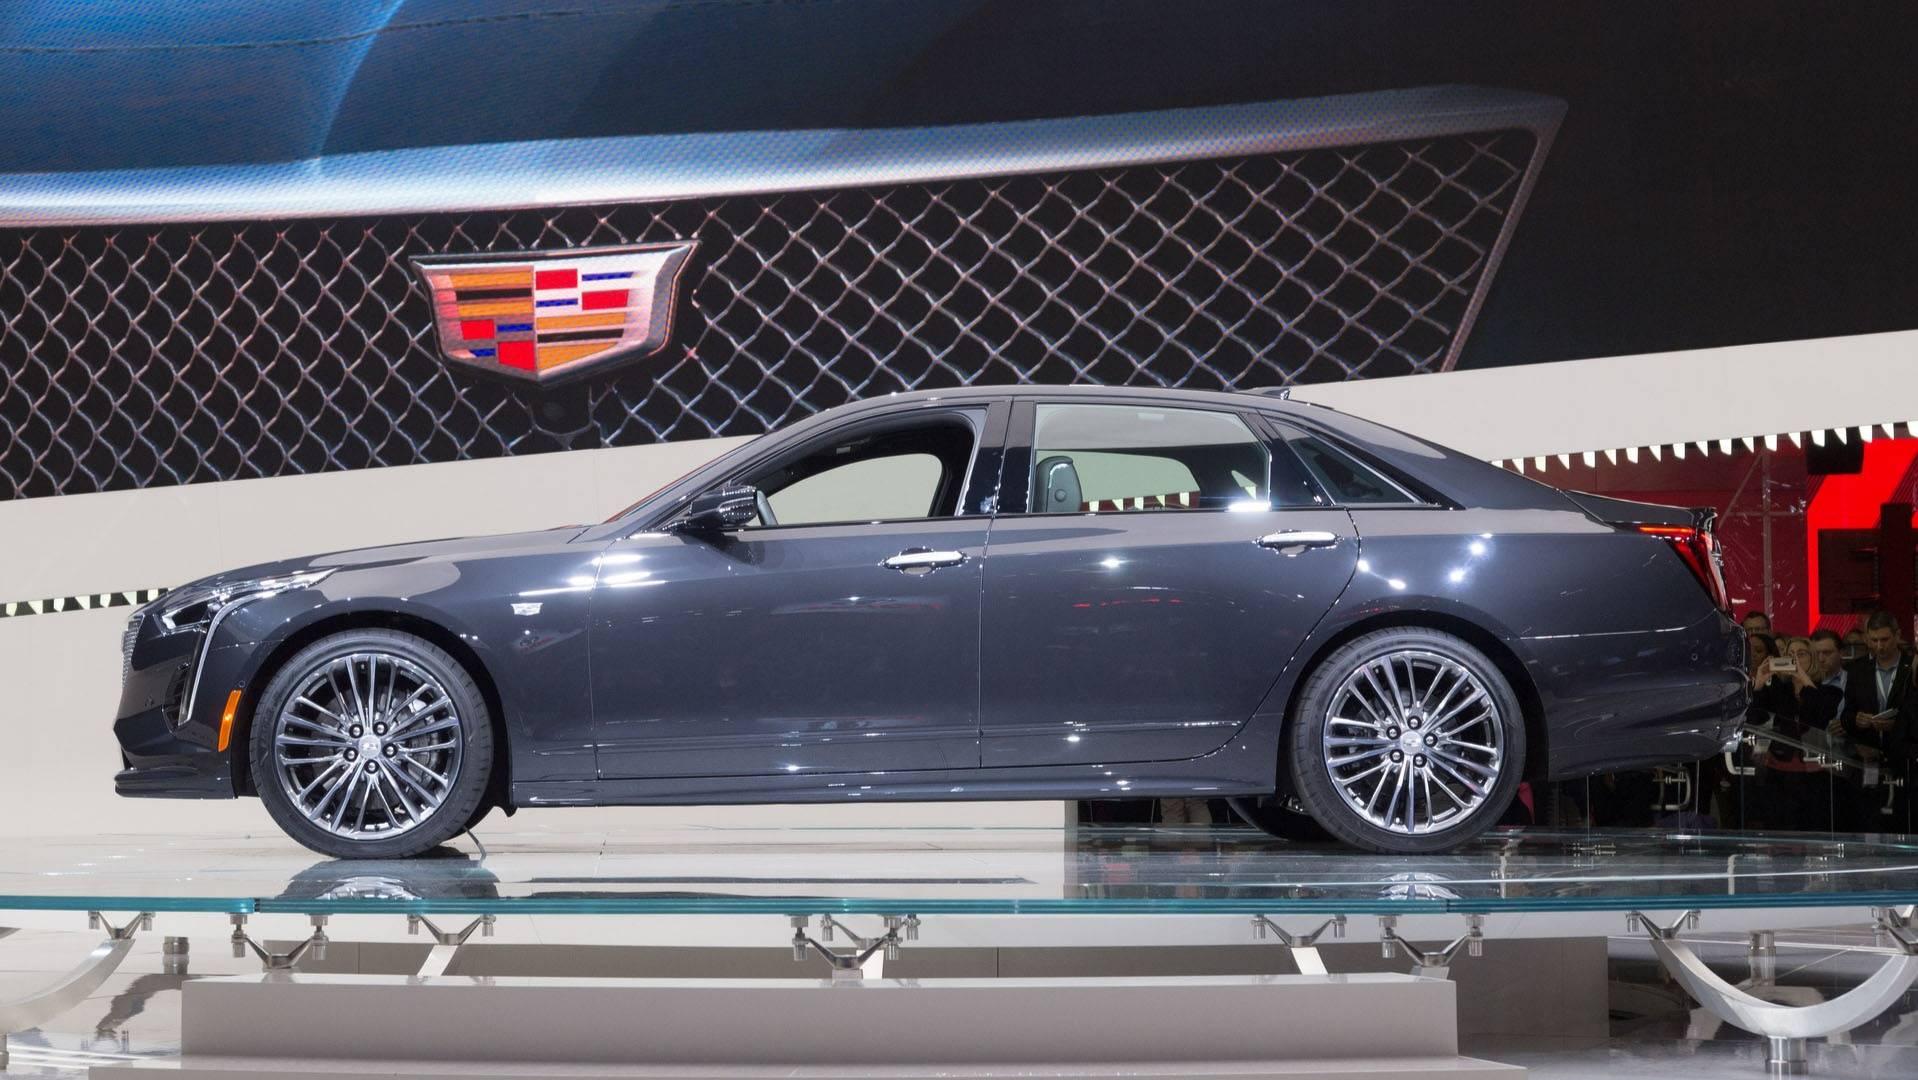 Cadillac CT6-V Twin-Turbo 4 2-liter V8 Engine Named 'Blackwing'